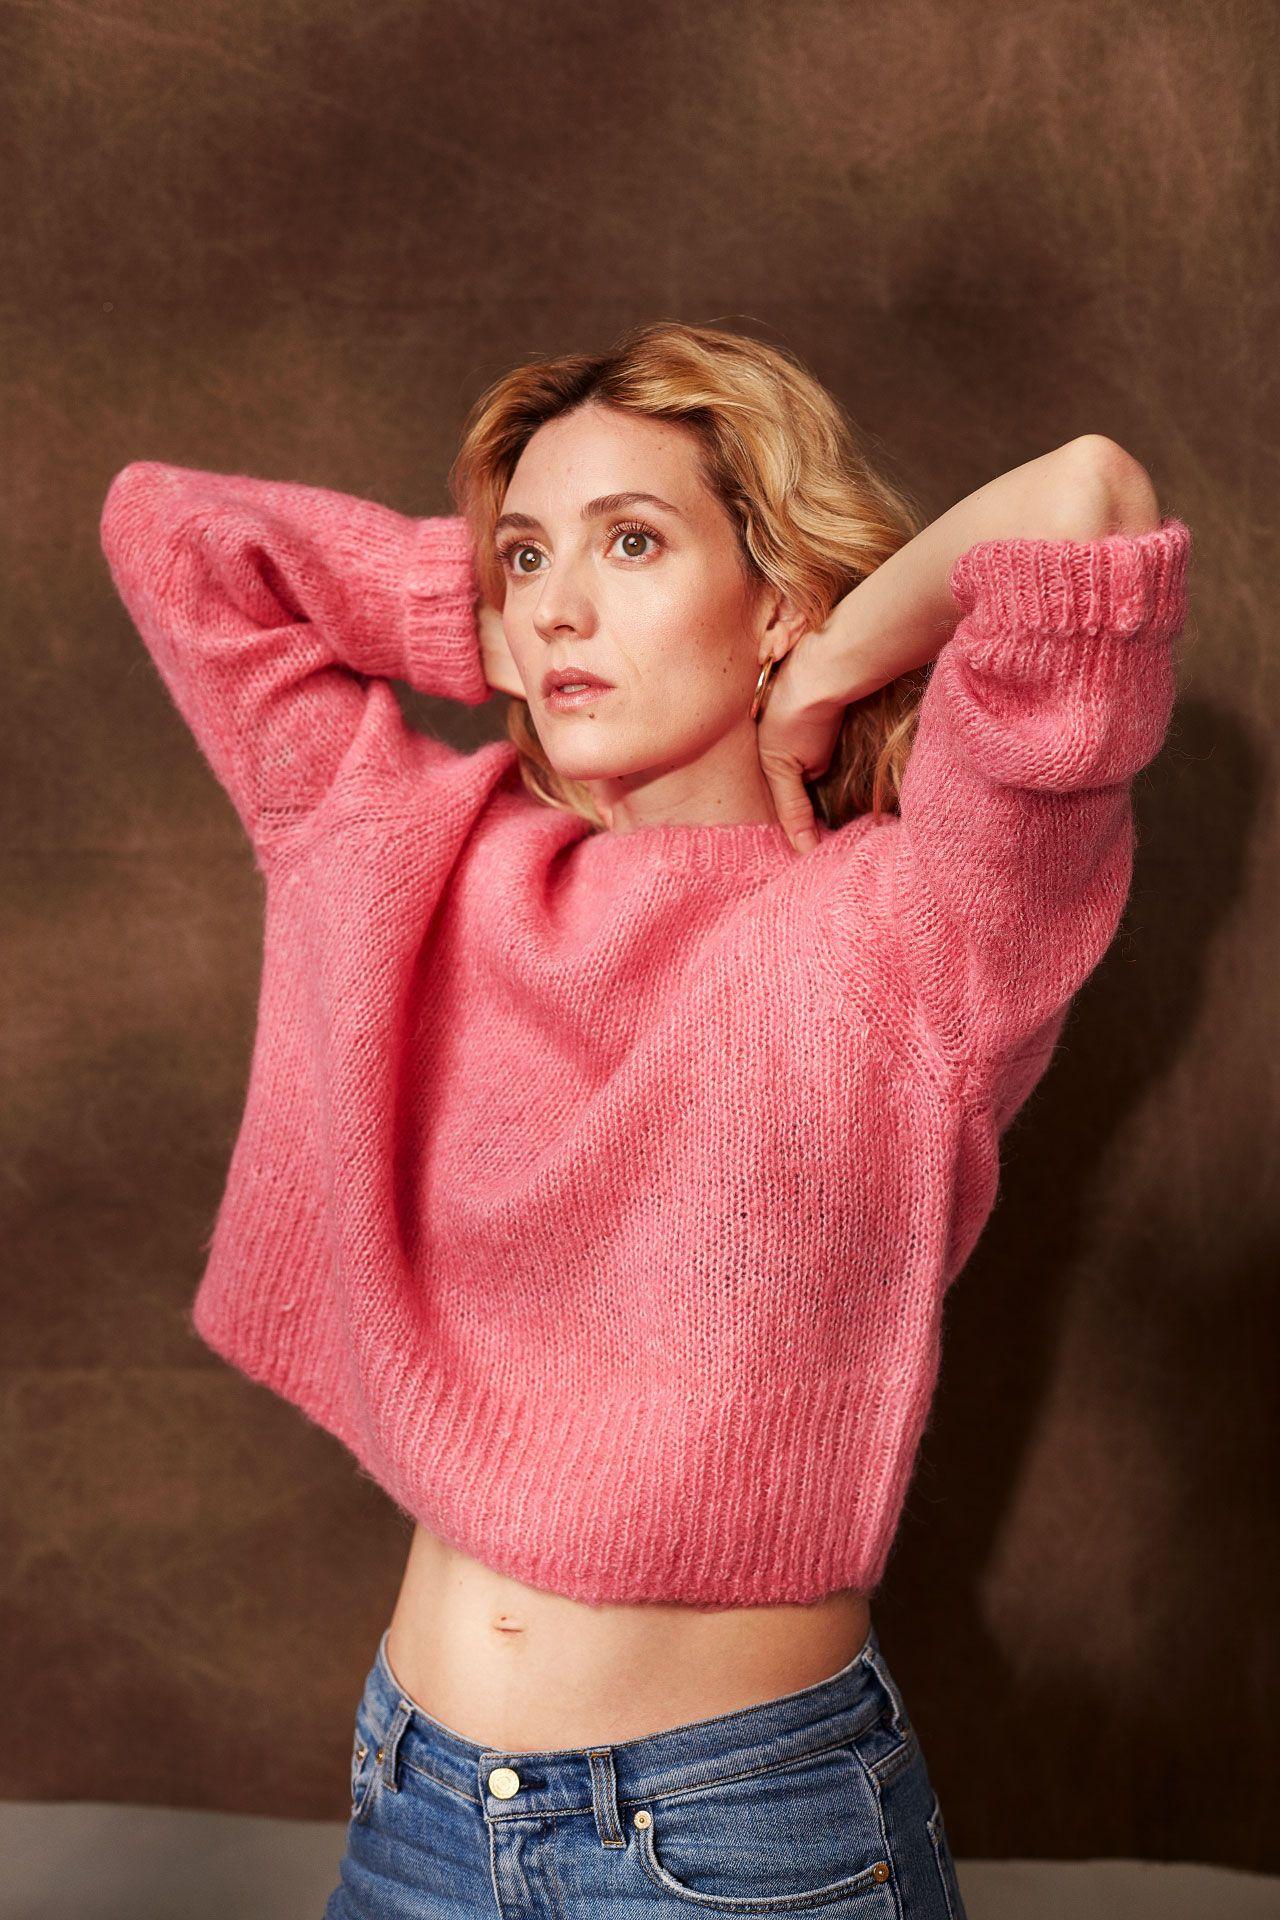 Evelyn Brochu en studio, portant un pull rose et un jean bleu, les bras en l'air.